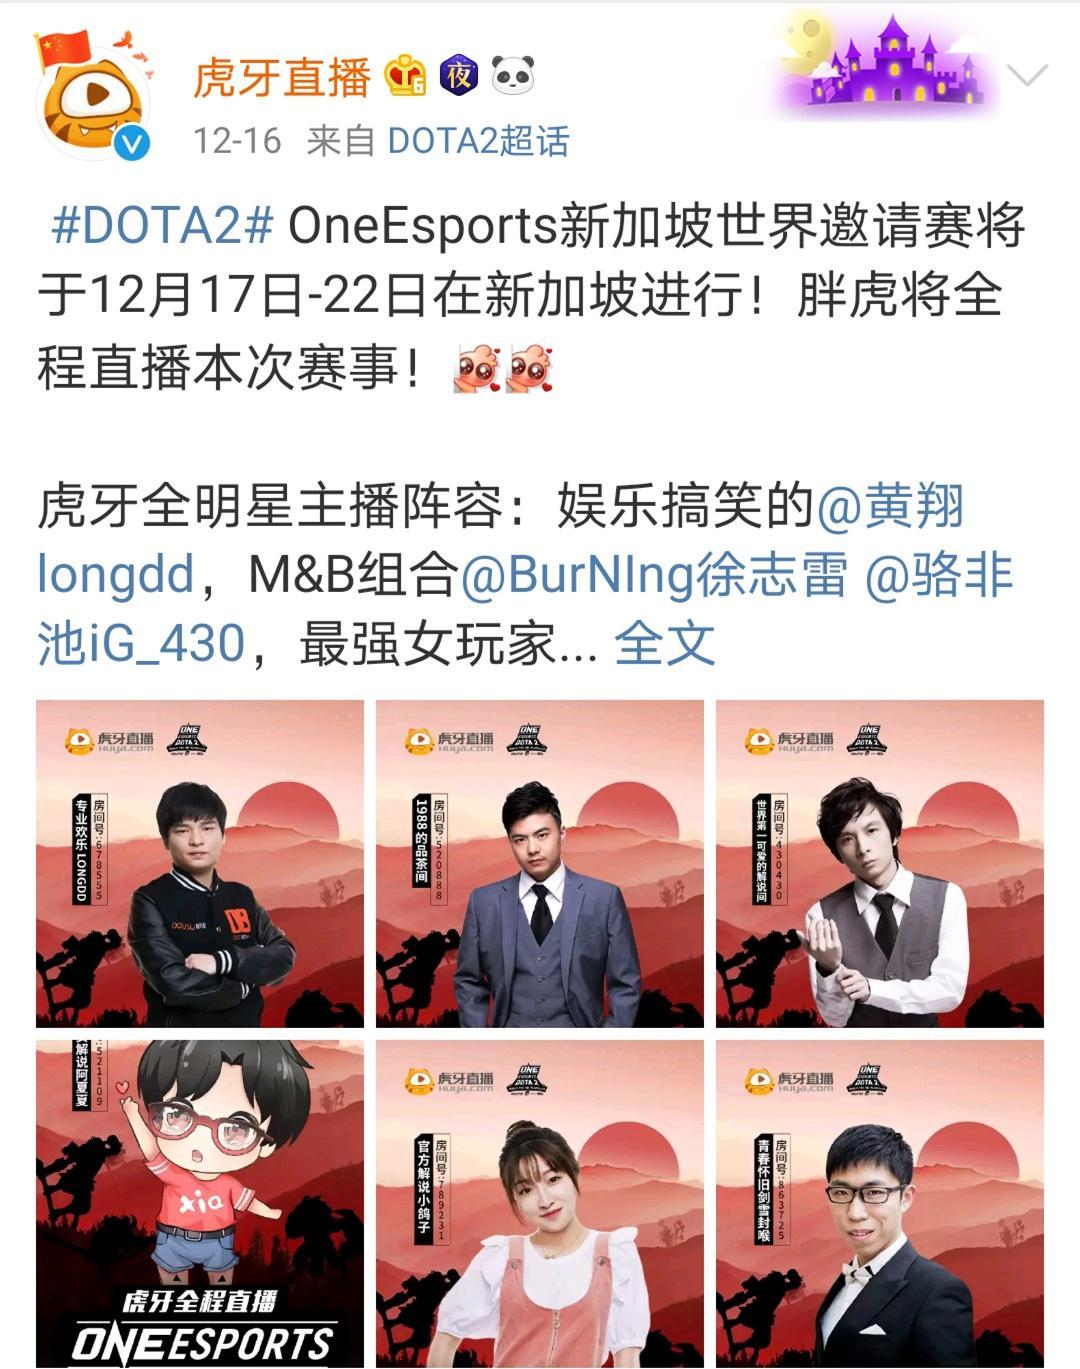 Dota2新加坡世界赛开启,虎牙龙神B神加盟解说,CN军团必胜